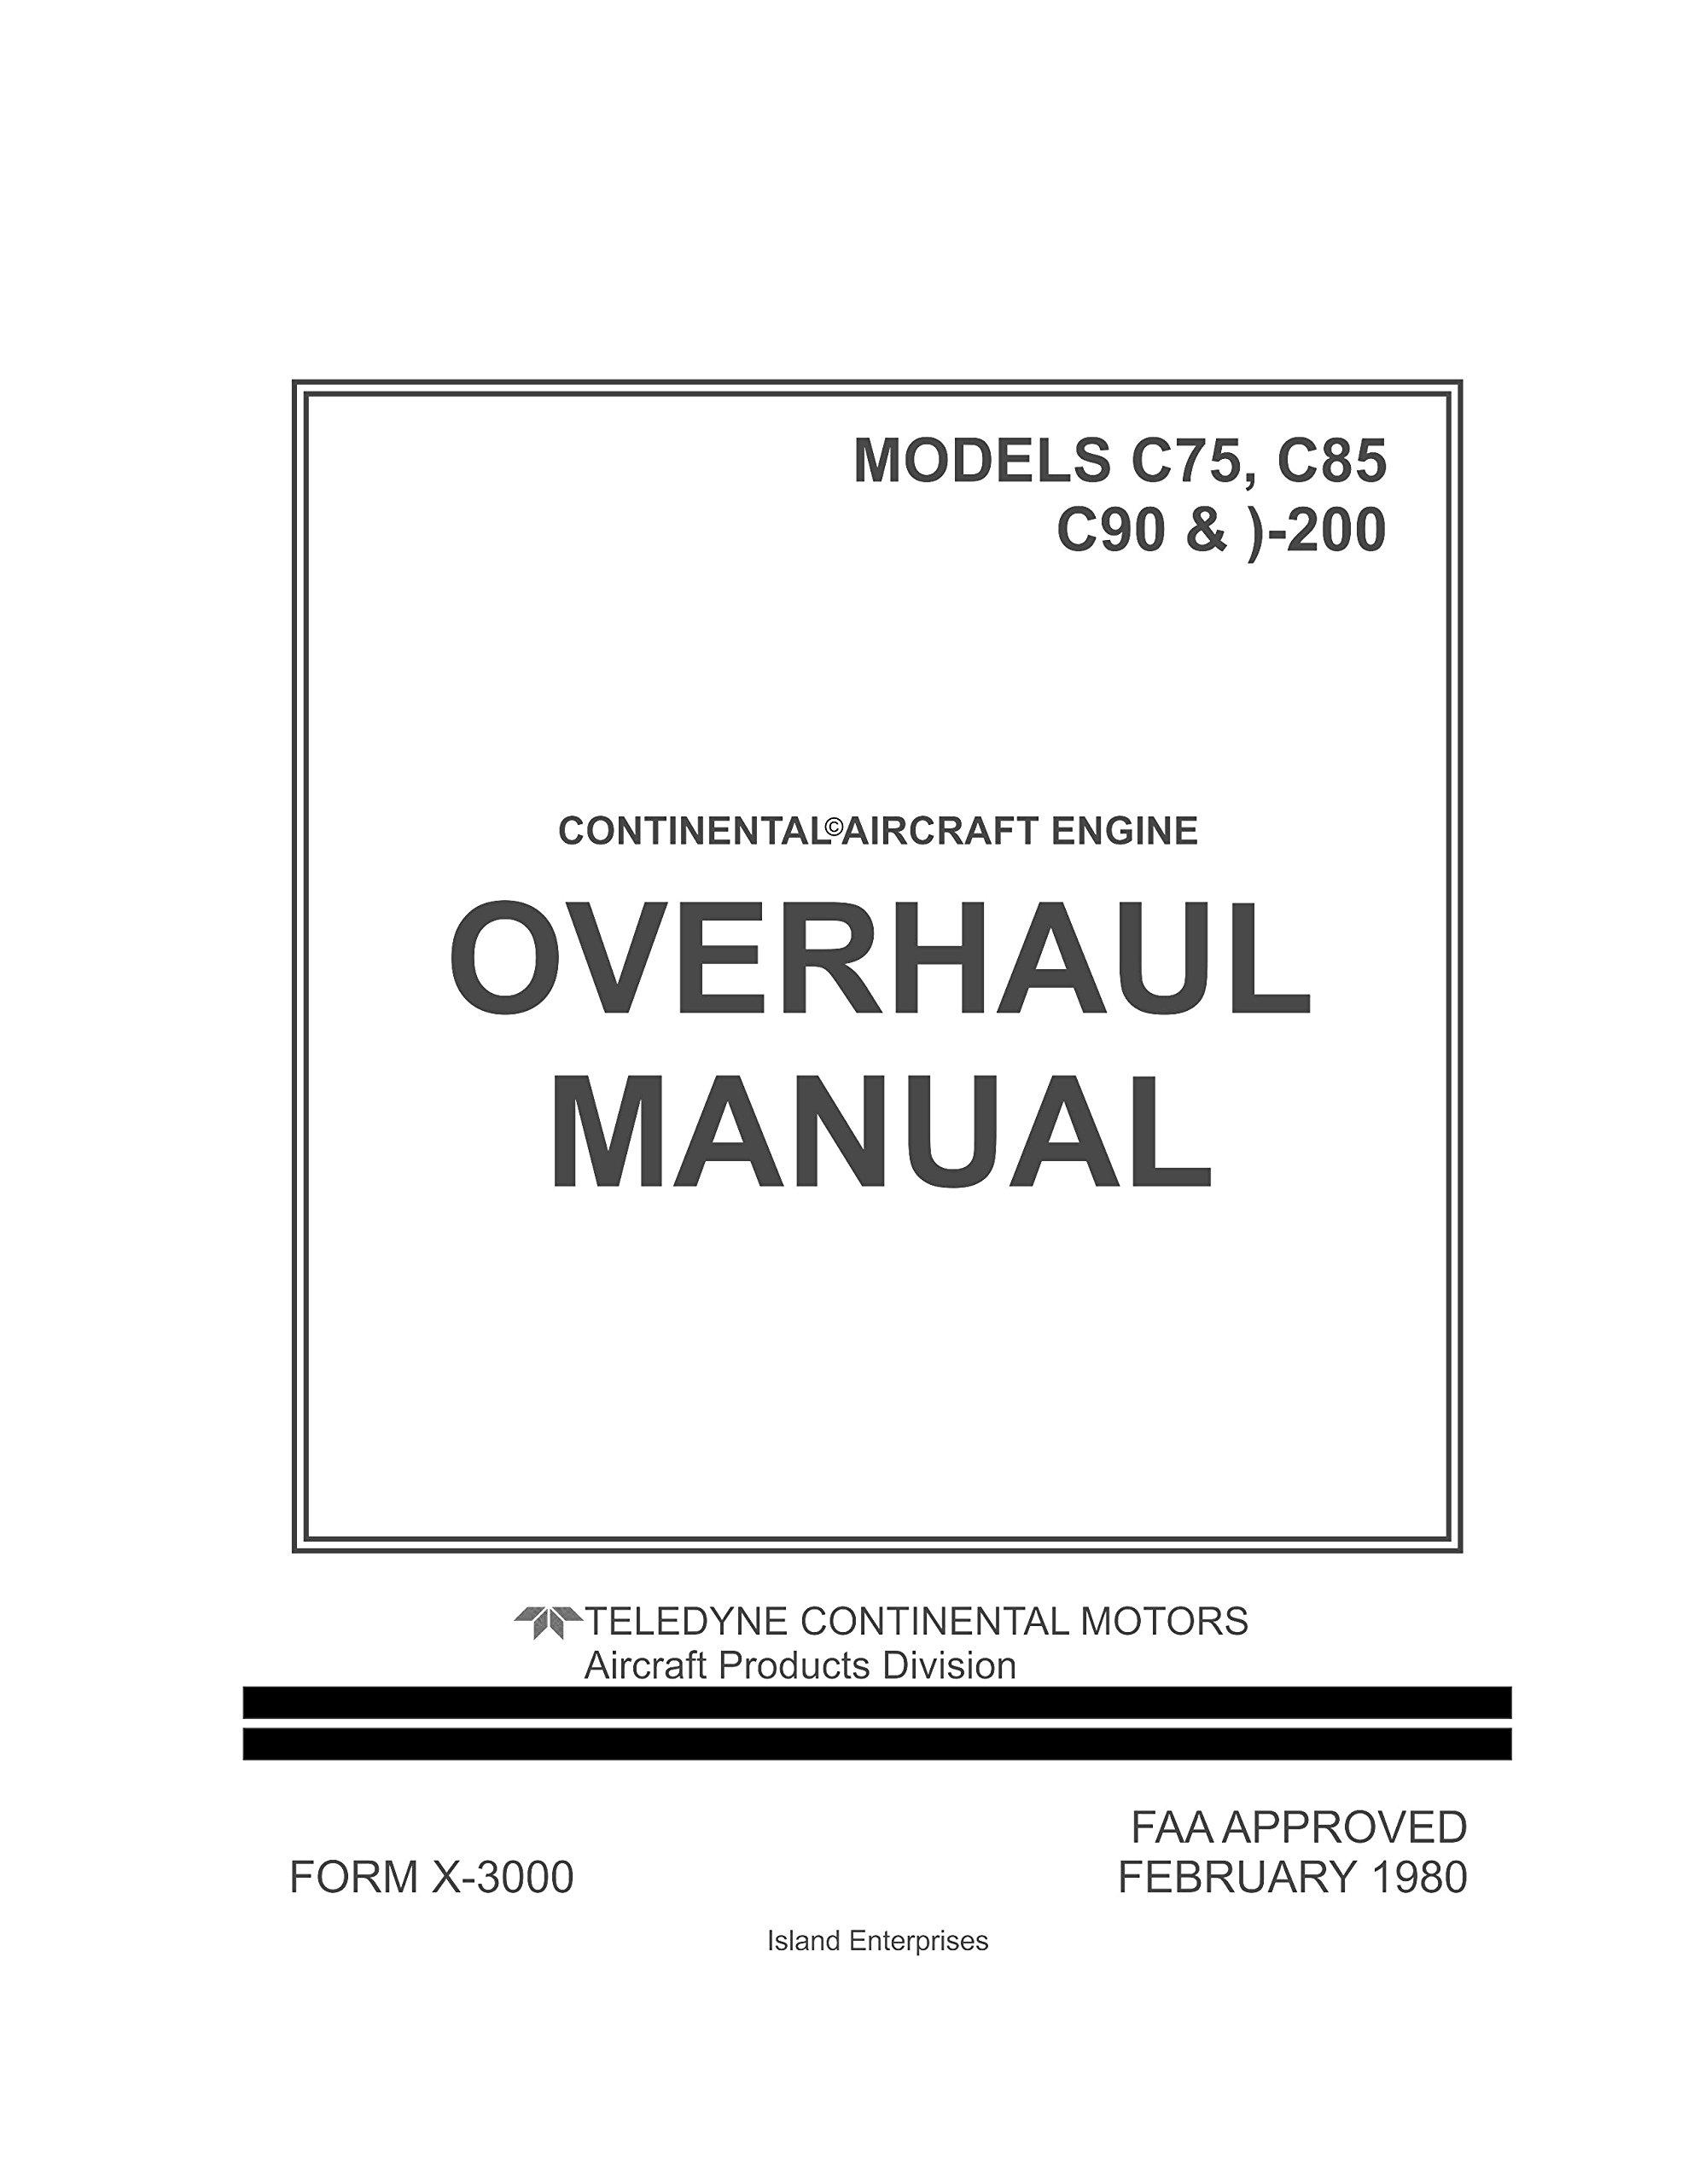 continental overhaul manual for aircraft engine models c75 c85 c90 rh amazon com continental overhaul manual pdf continental overhaul manual pdf